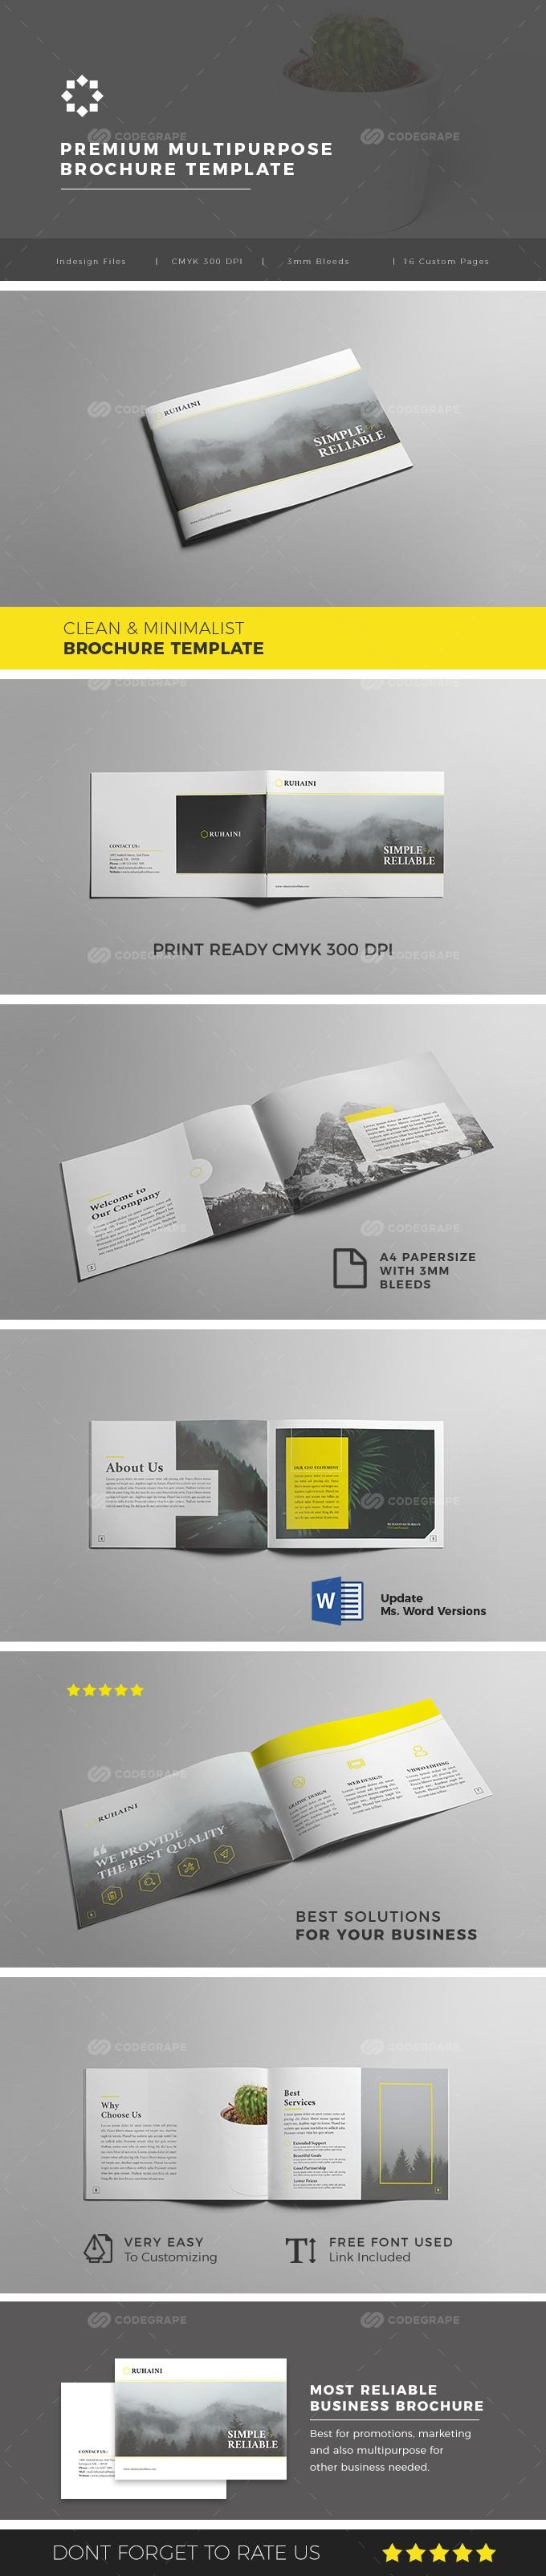 Multipurpose Business Brochure